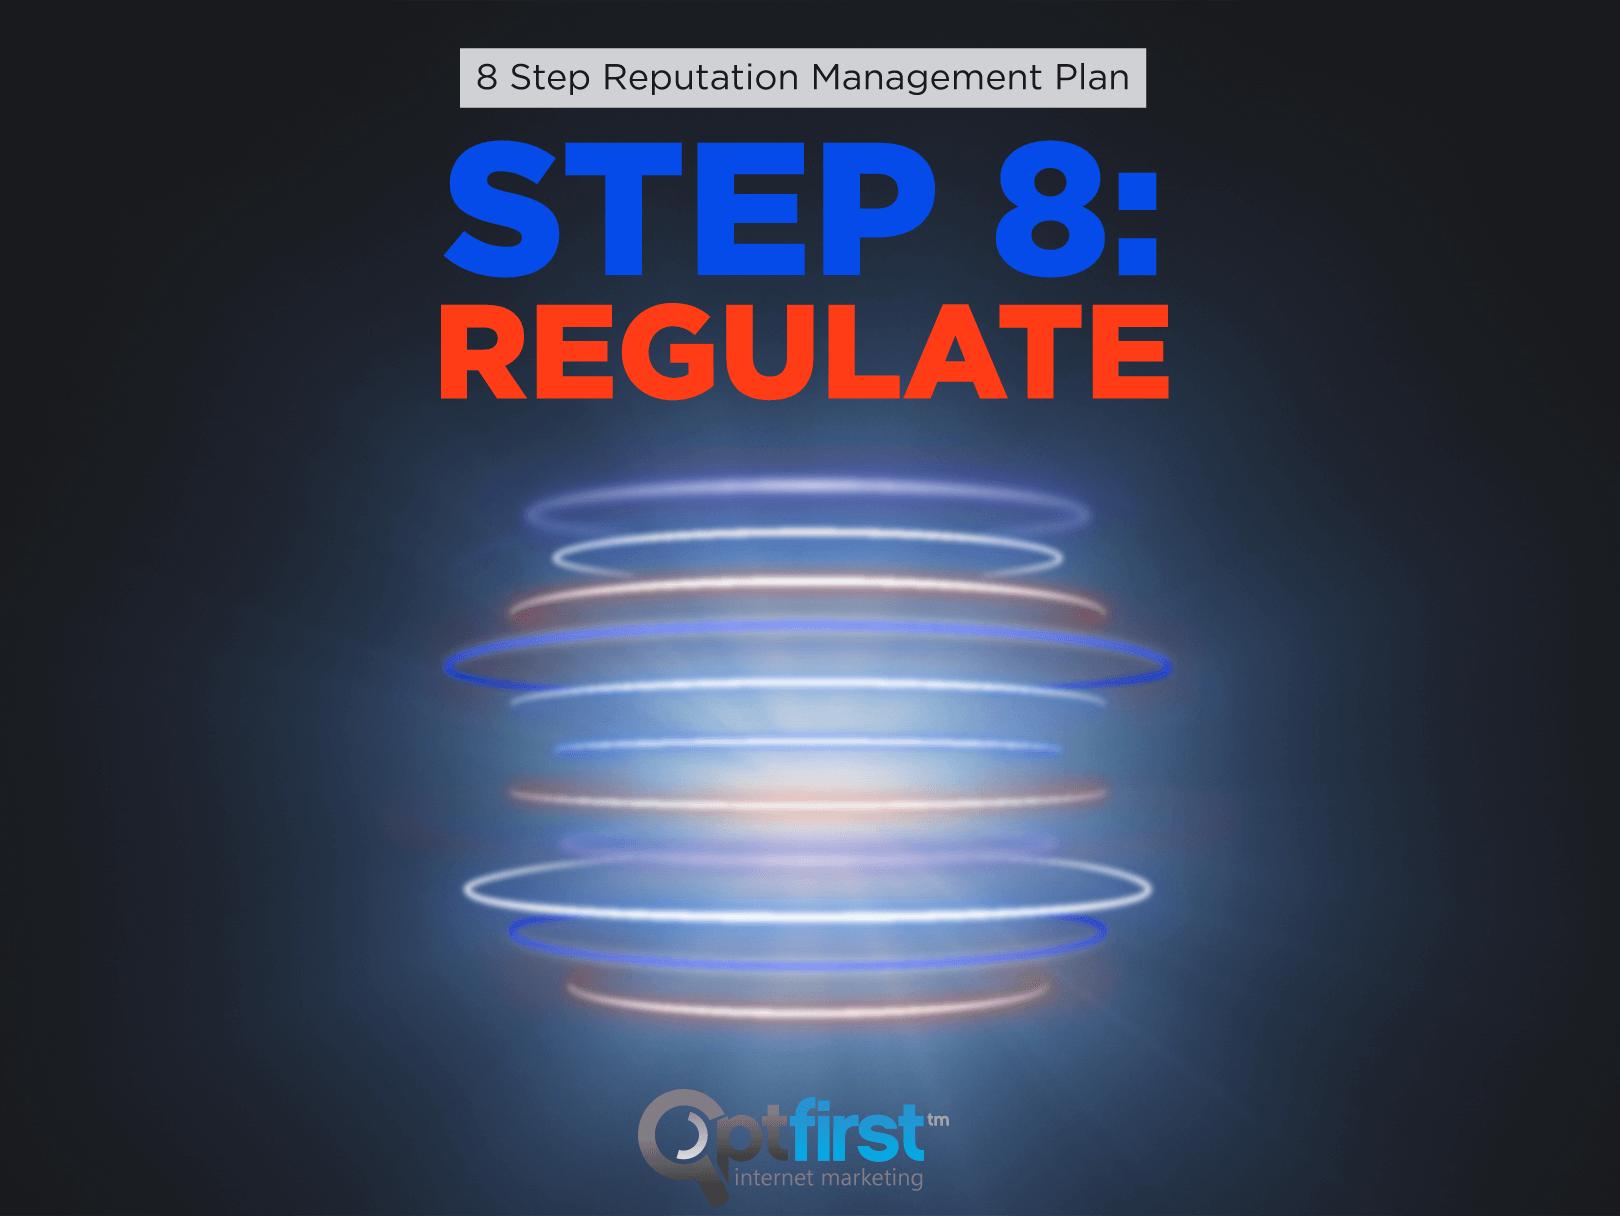 8 Step Reputation Management Plan Step 8: Regulate